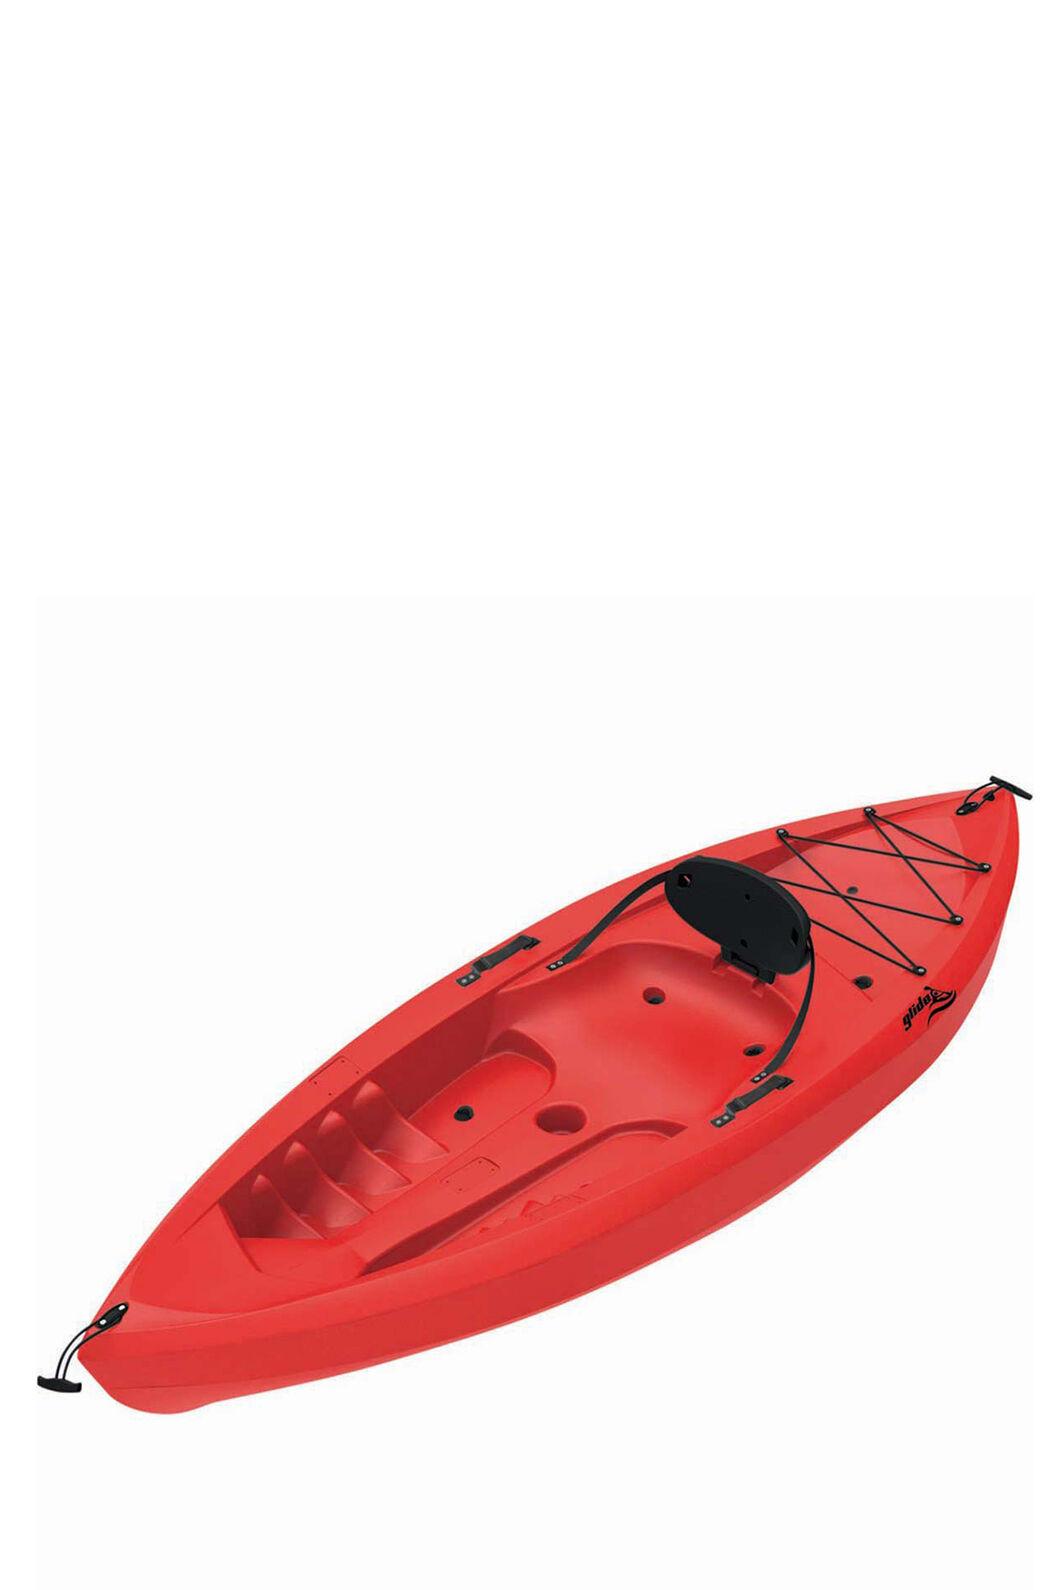 Glide Sit-On-Top Kayak, None, hi-res